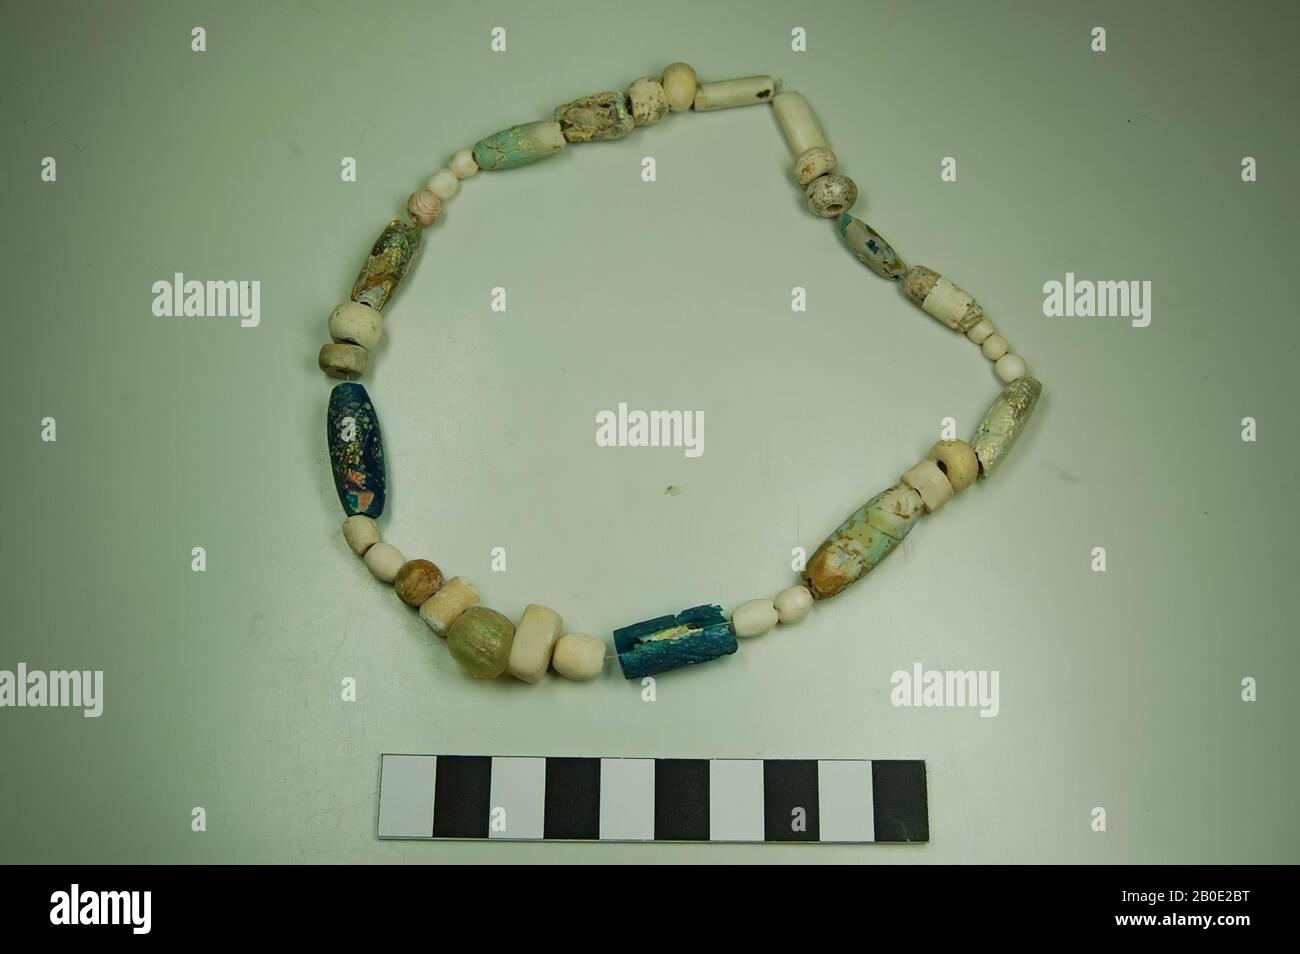 6 X Roman//Byzantine decorated blue glass beads circa 400-600 AD